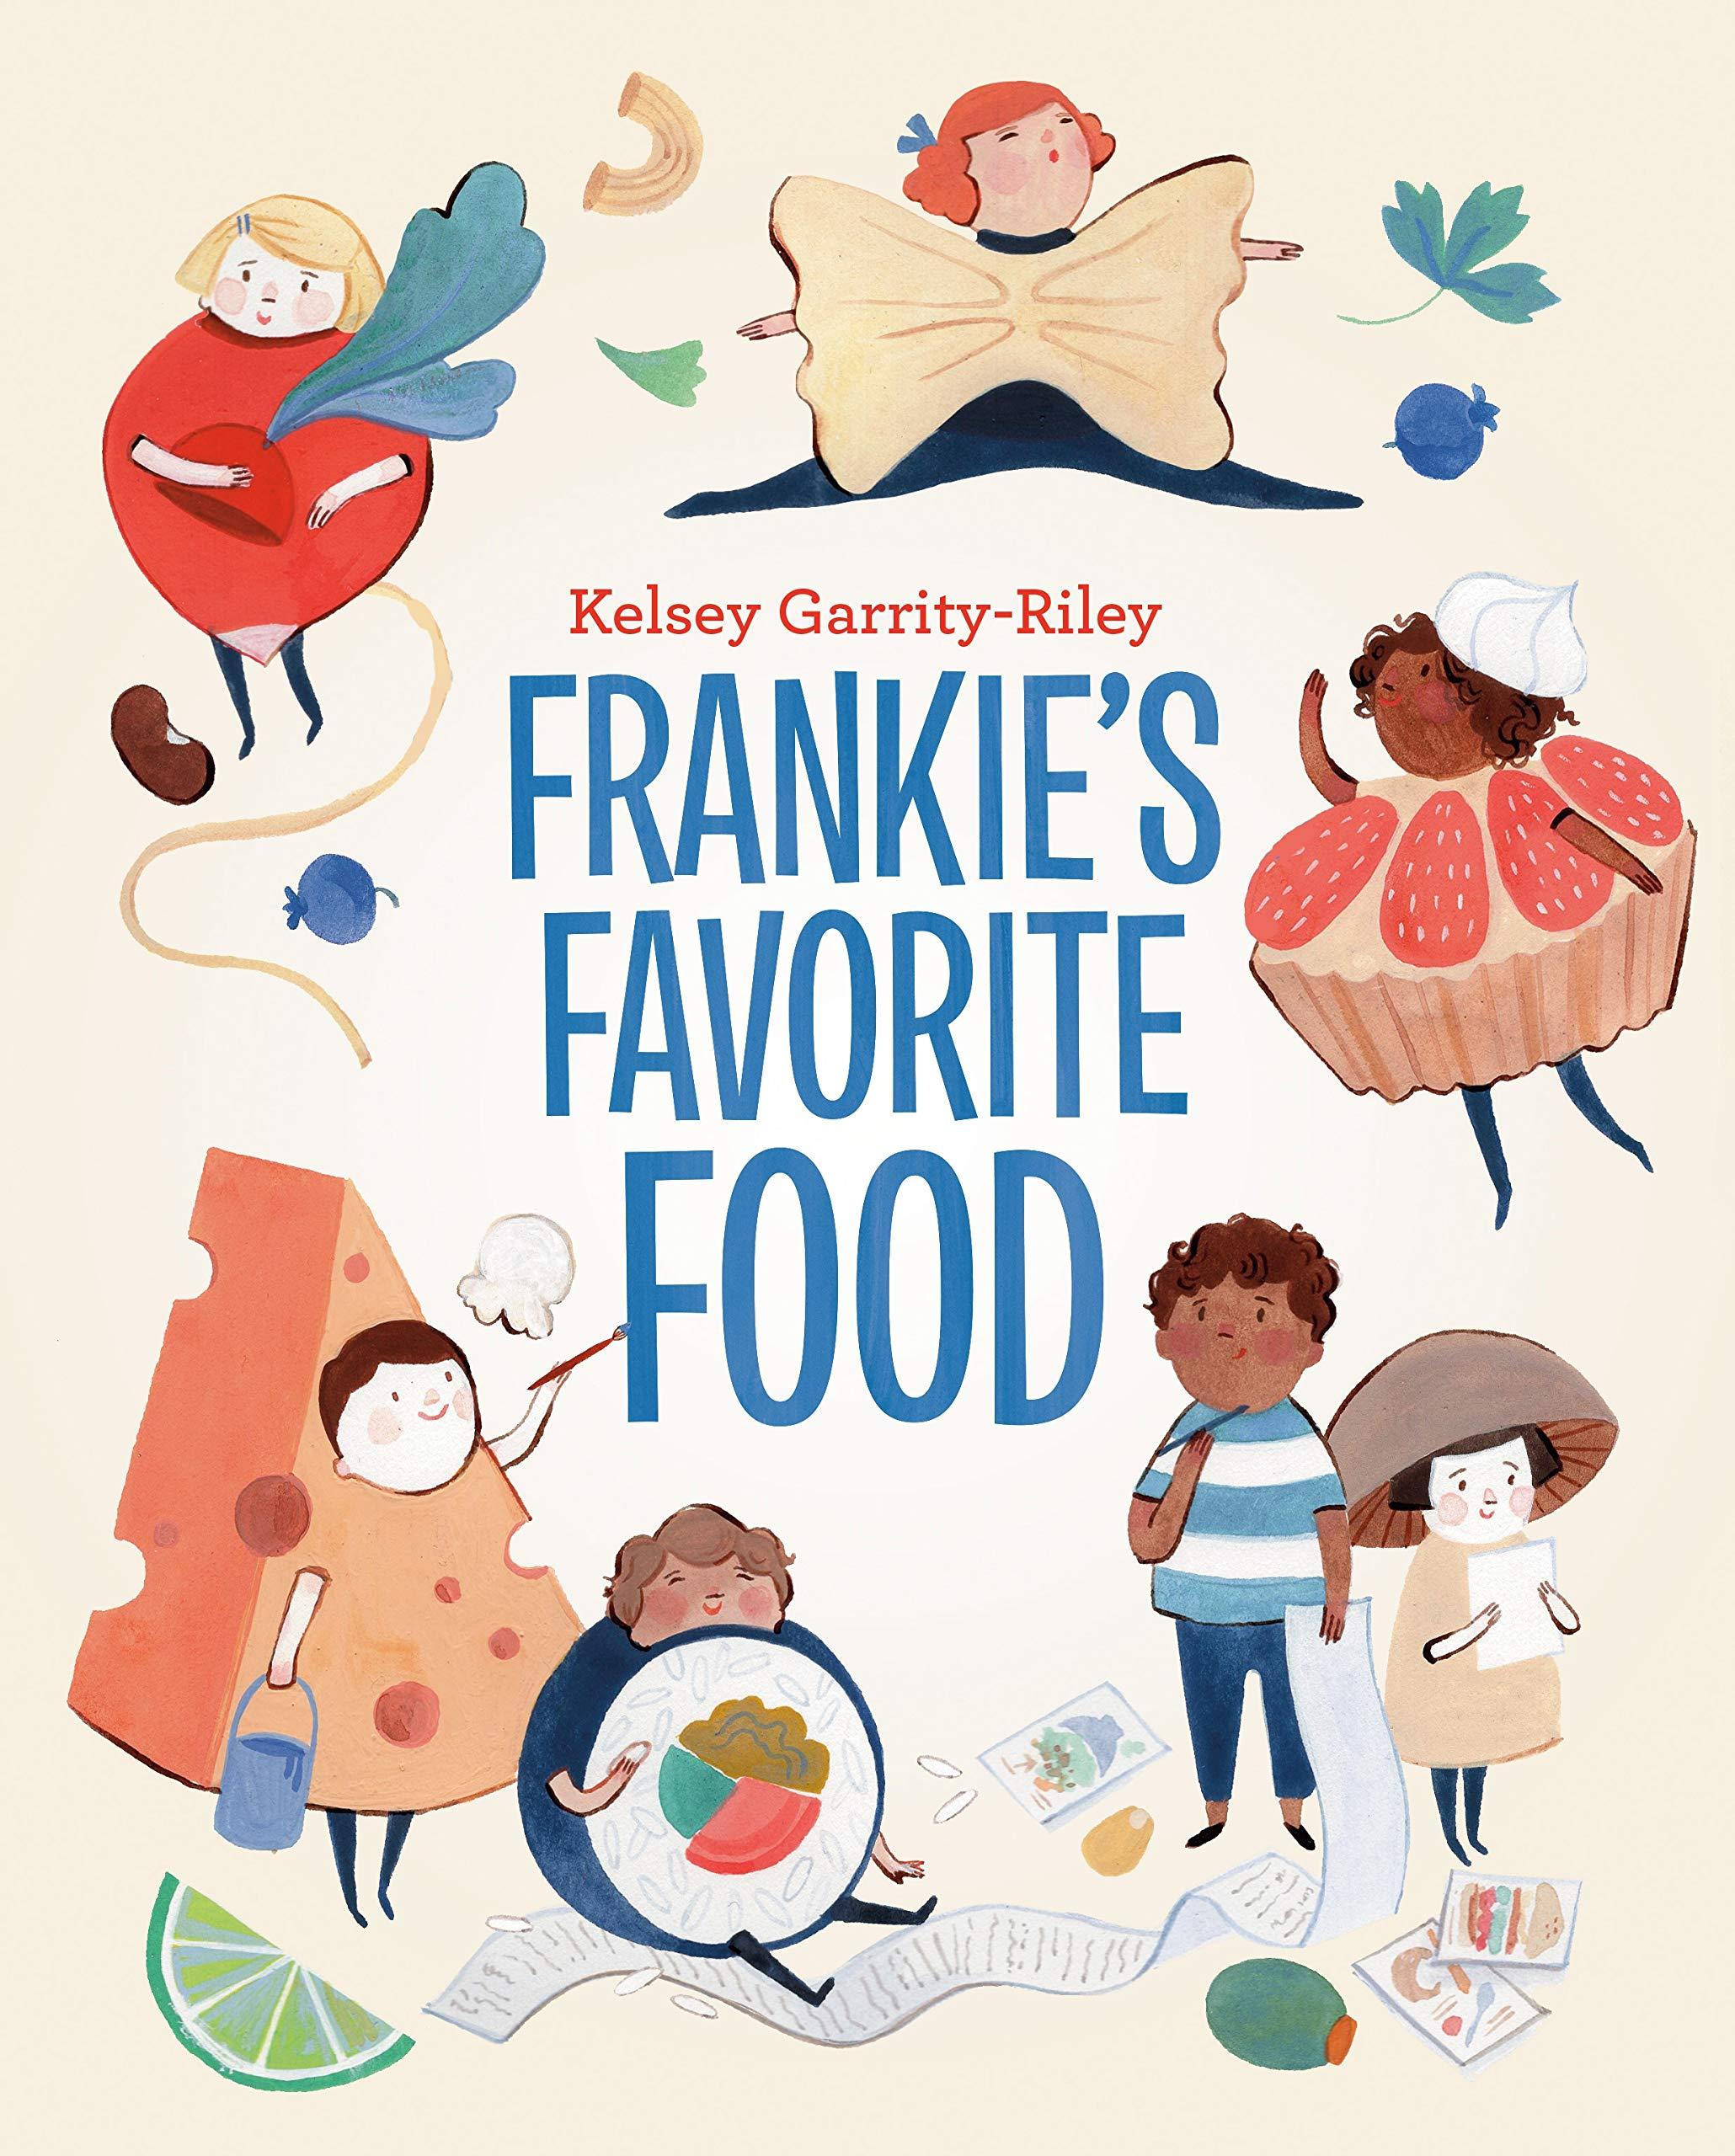 Sunday Story Time: Frankie's Favorite Food by Kelsey Garrity-Riley